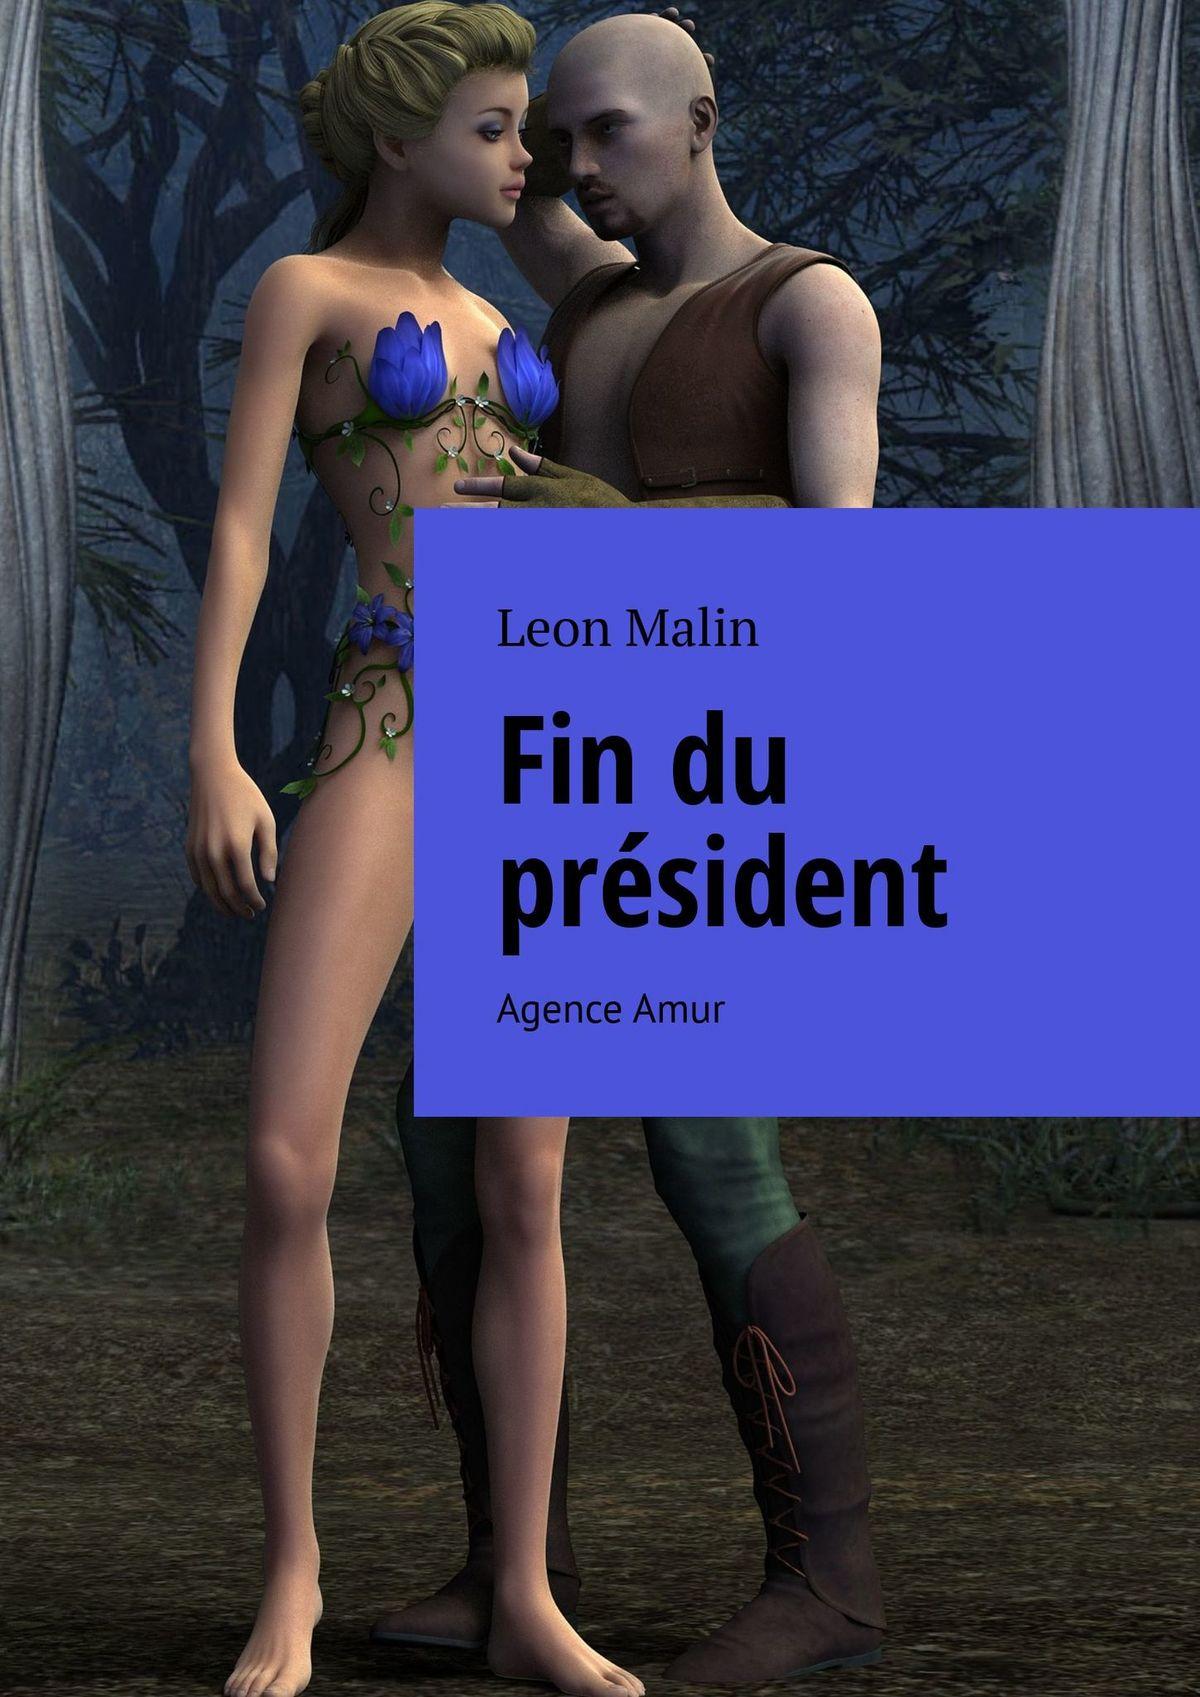 Leon Malin Fin du président. Agence Amur